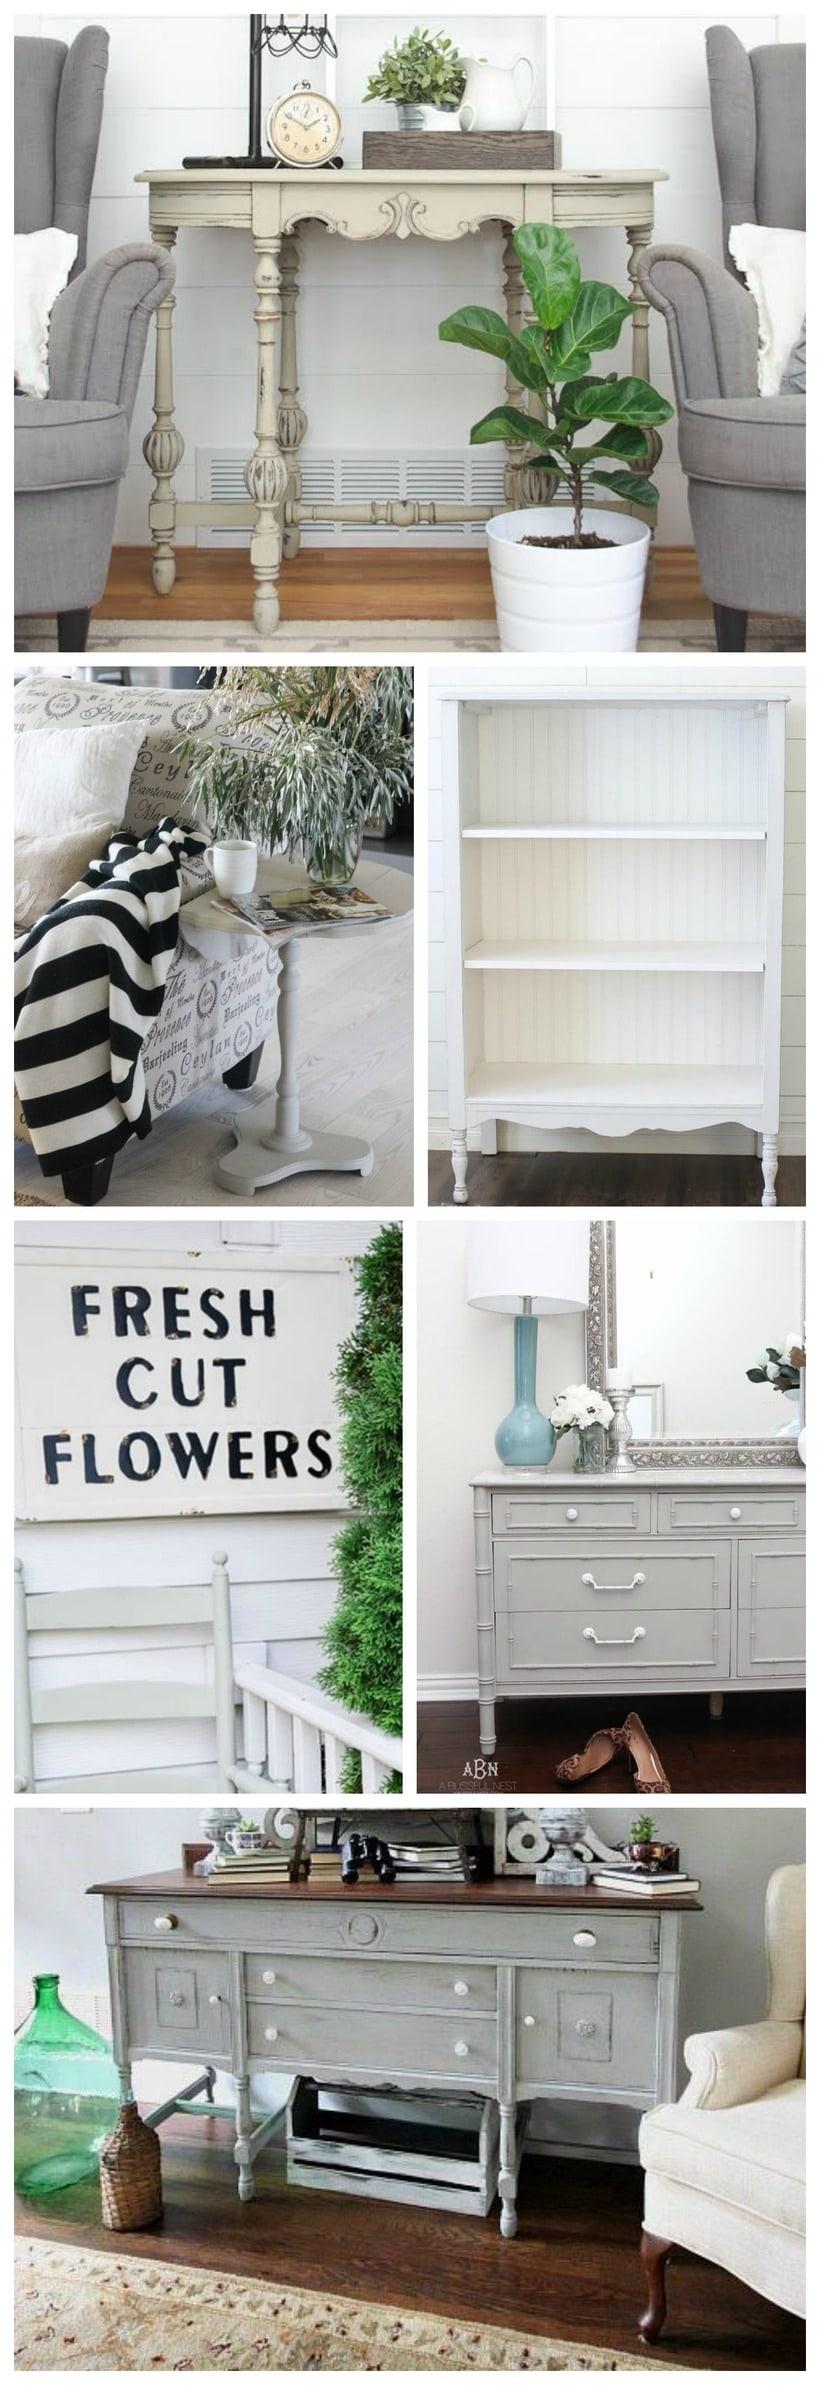 Chalk paint Farmhouse makeovers - Great inspiration for cottage & farmhouse decor